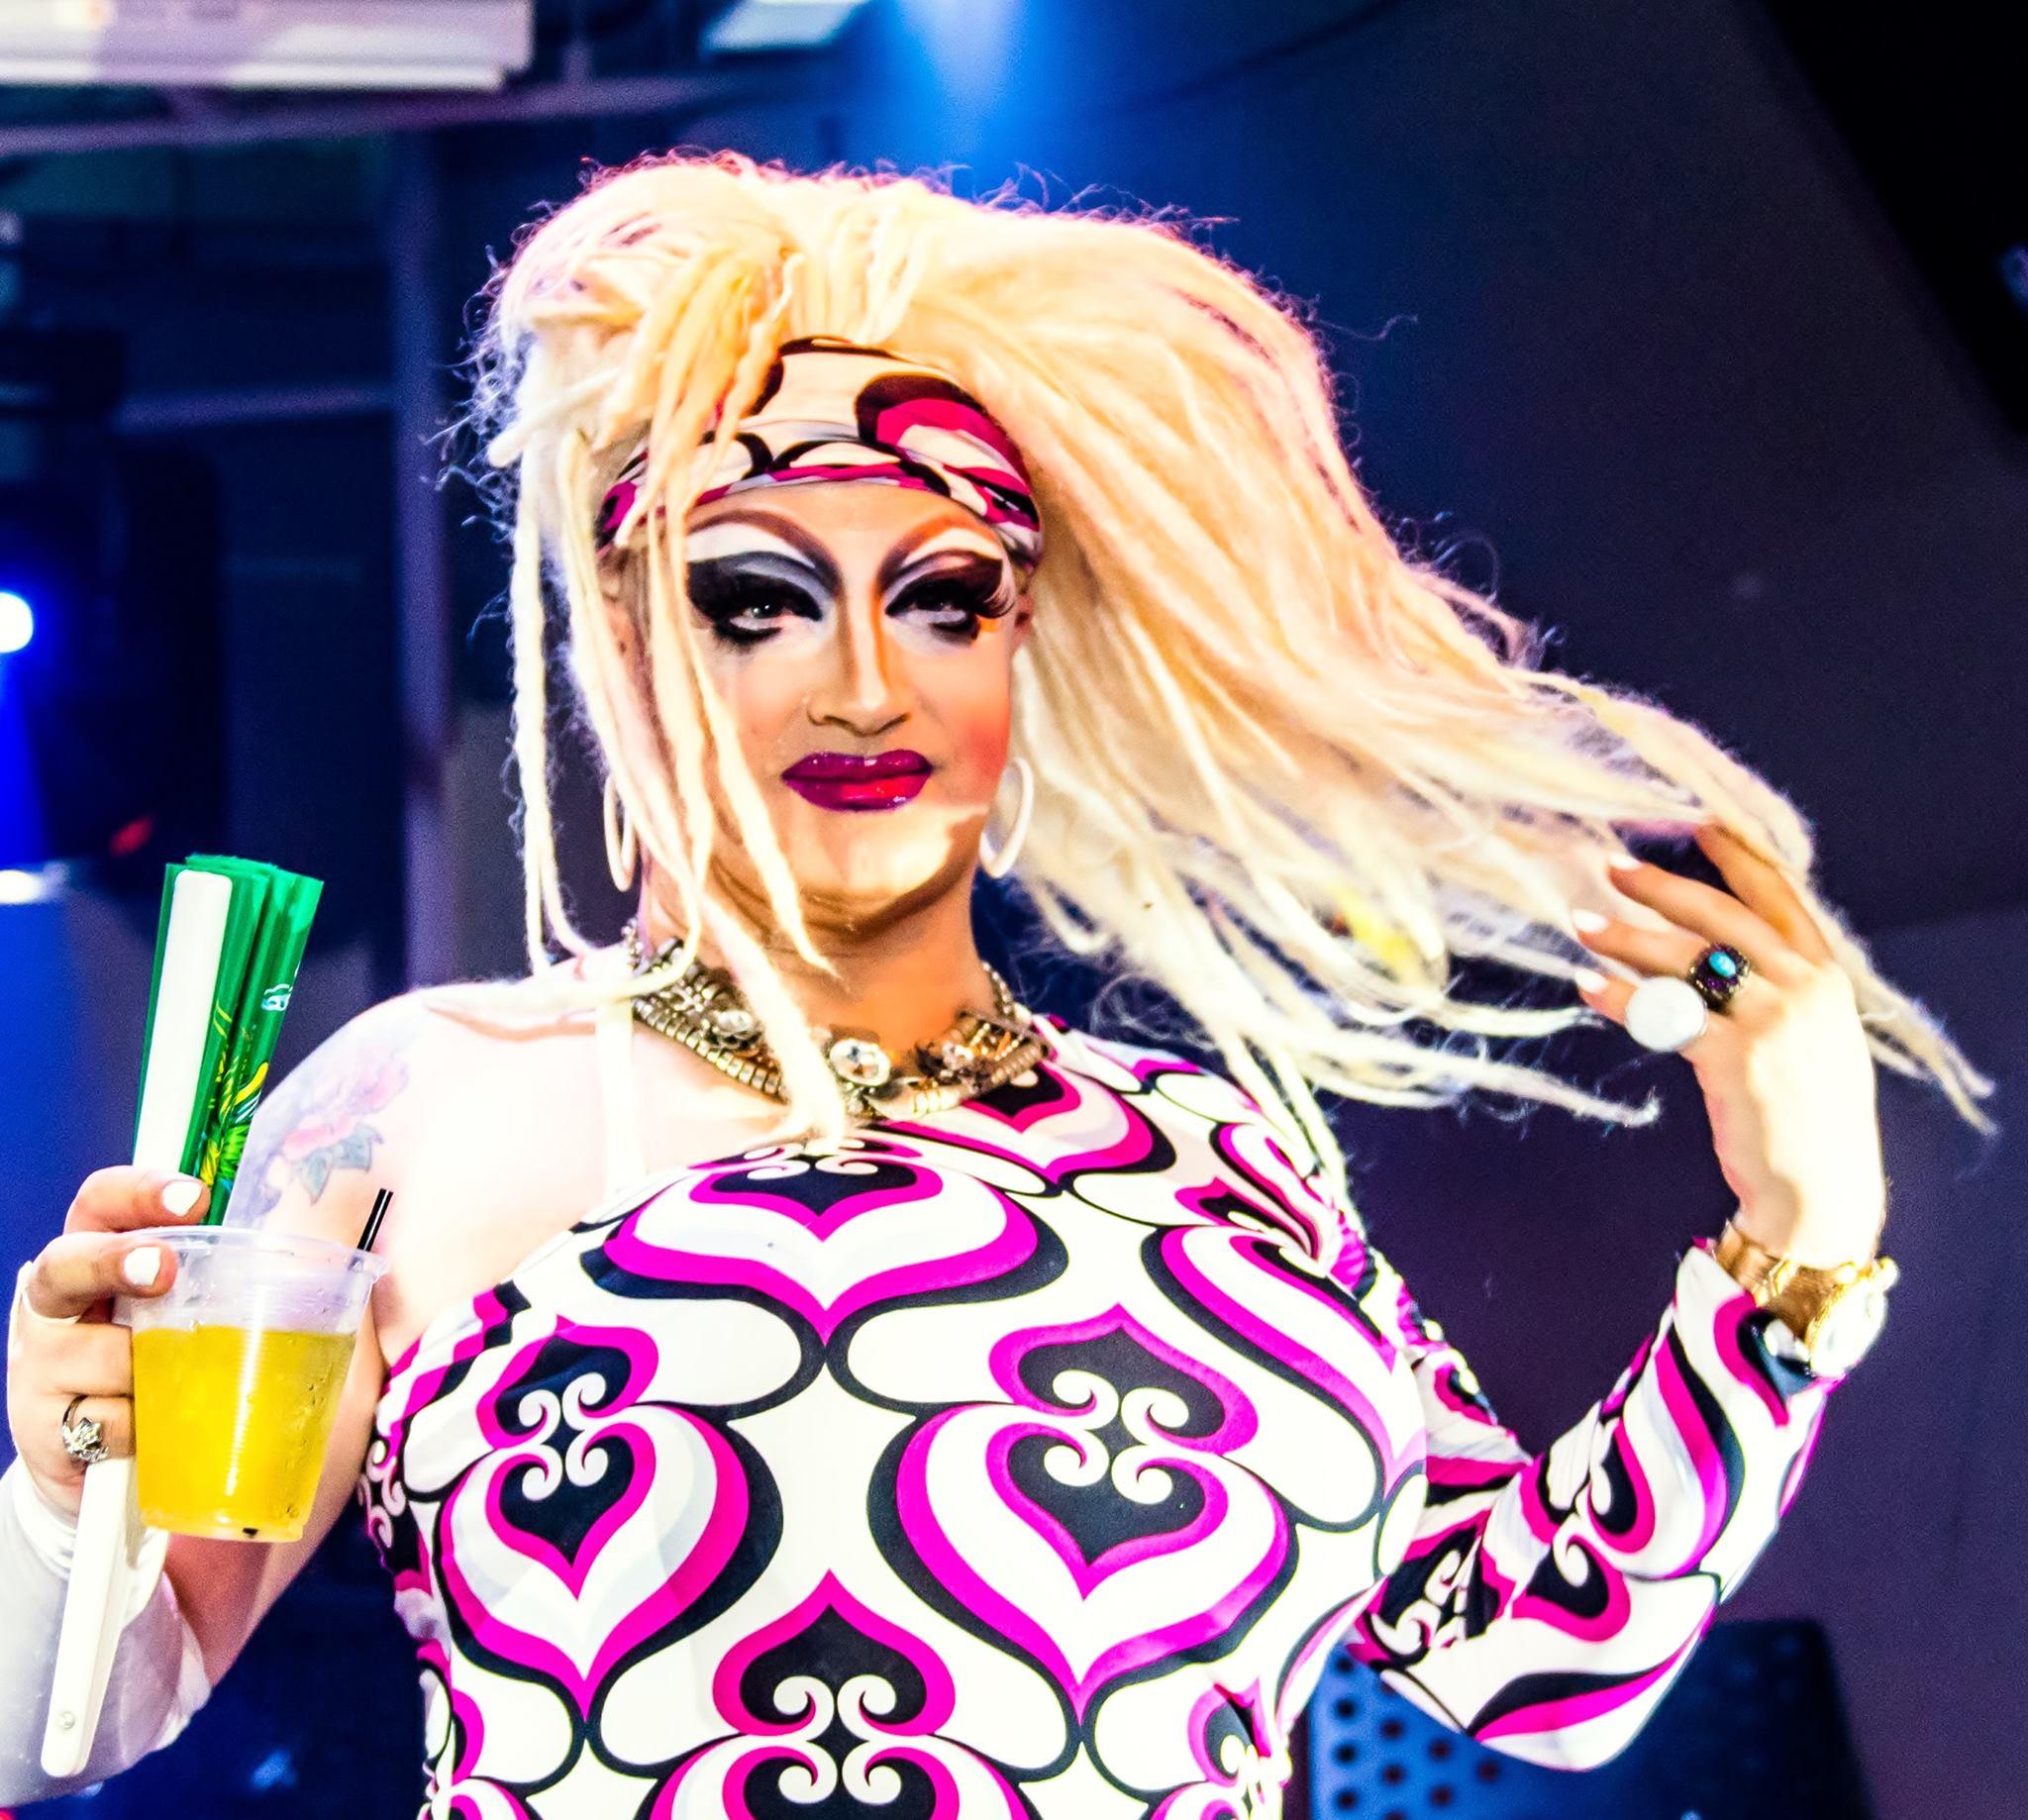 Magnolia La Manga, drag queen and performer at Mr. Gay Taiwan 2016.